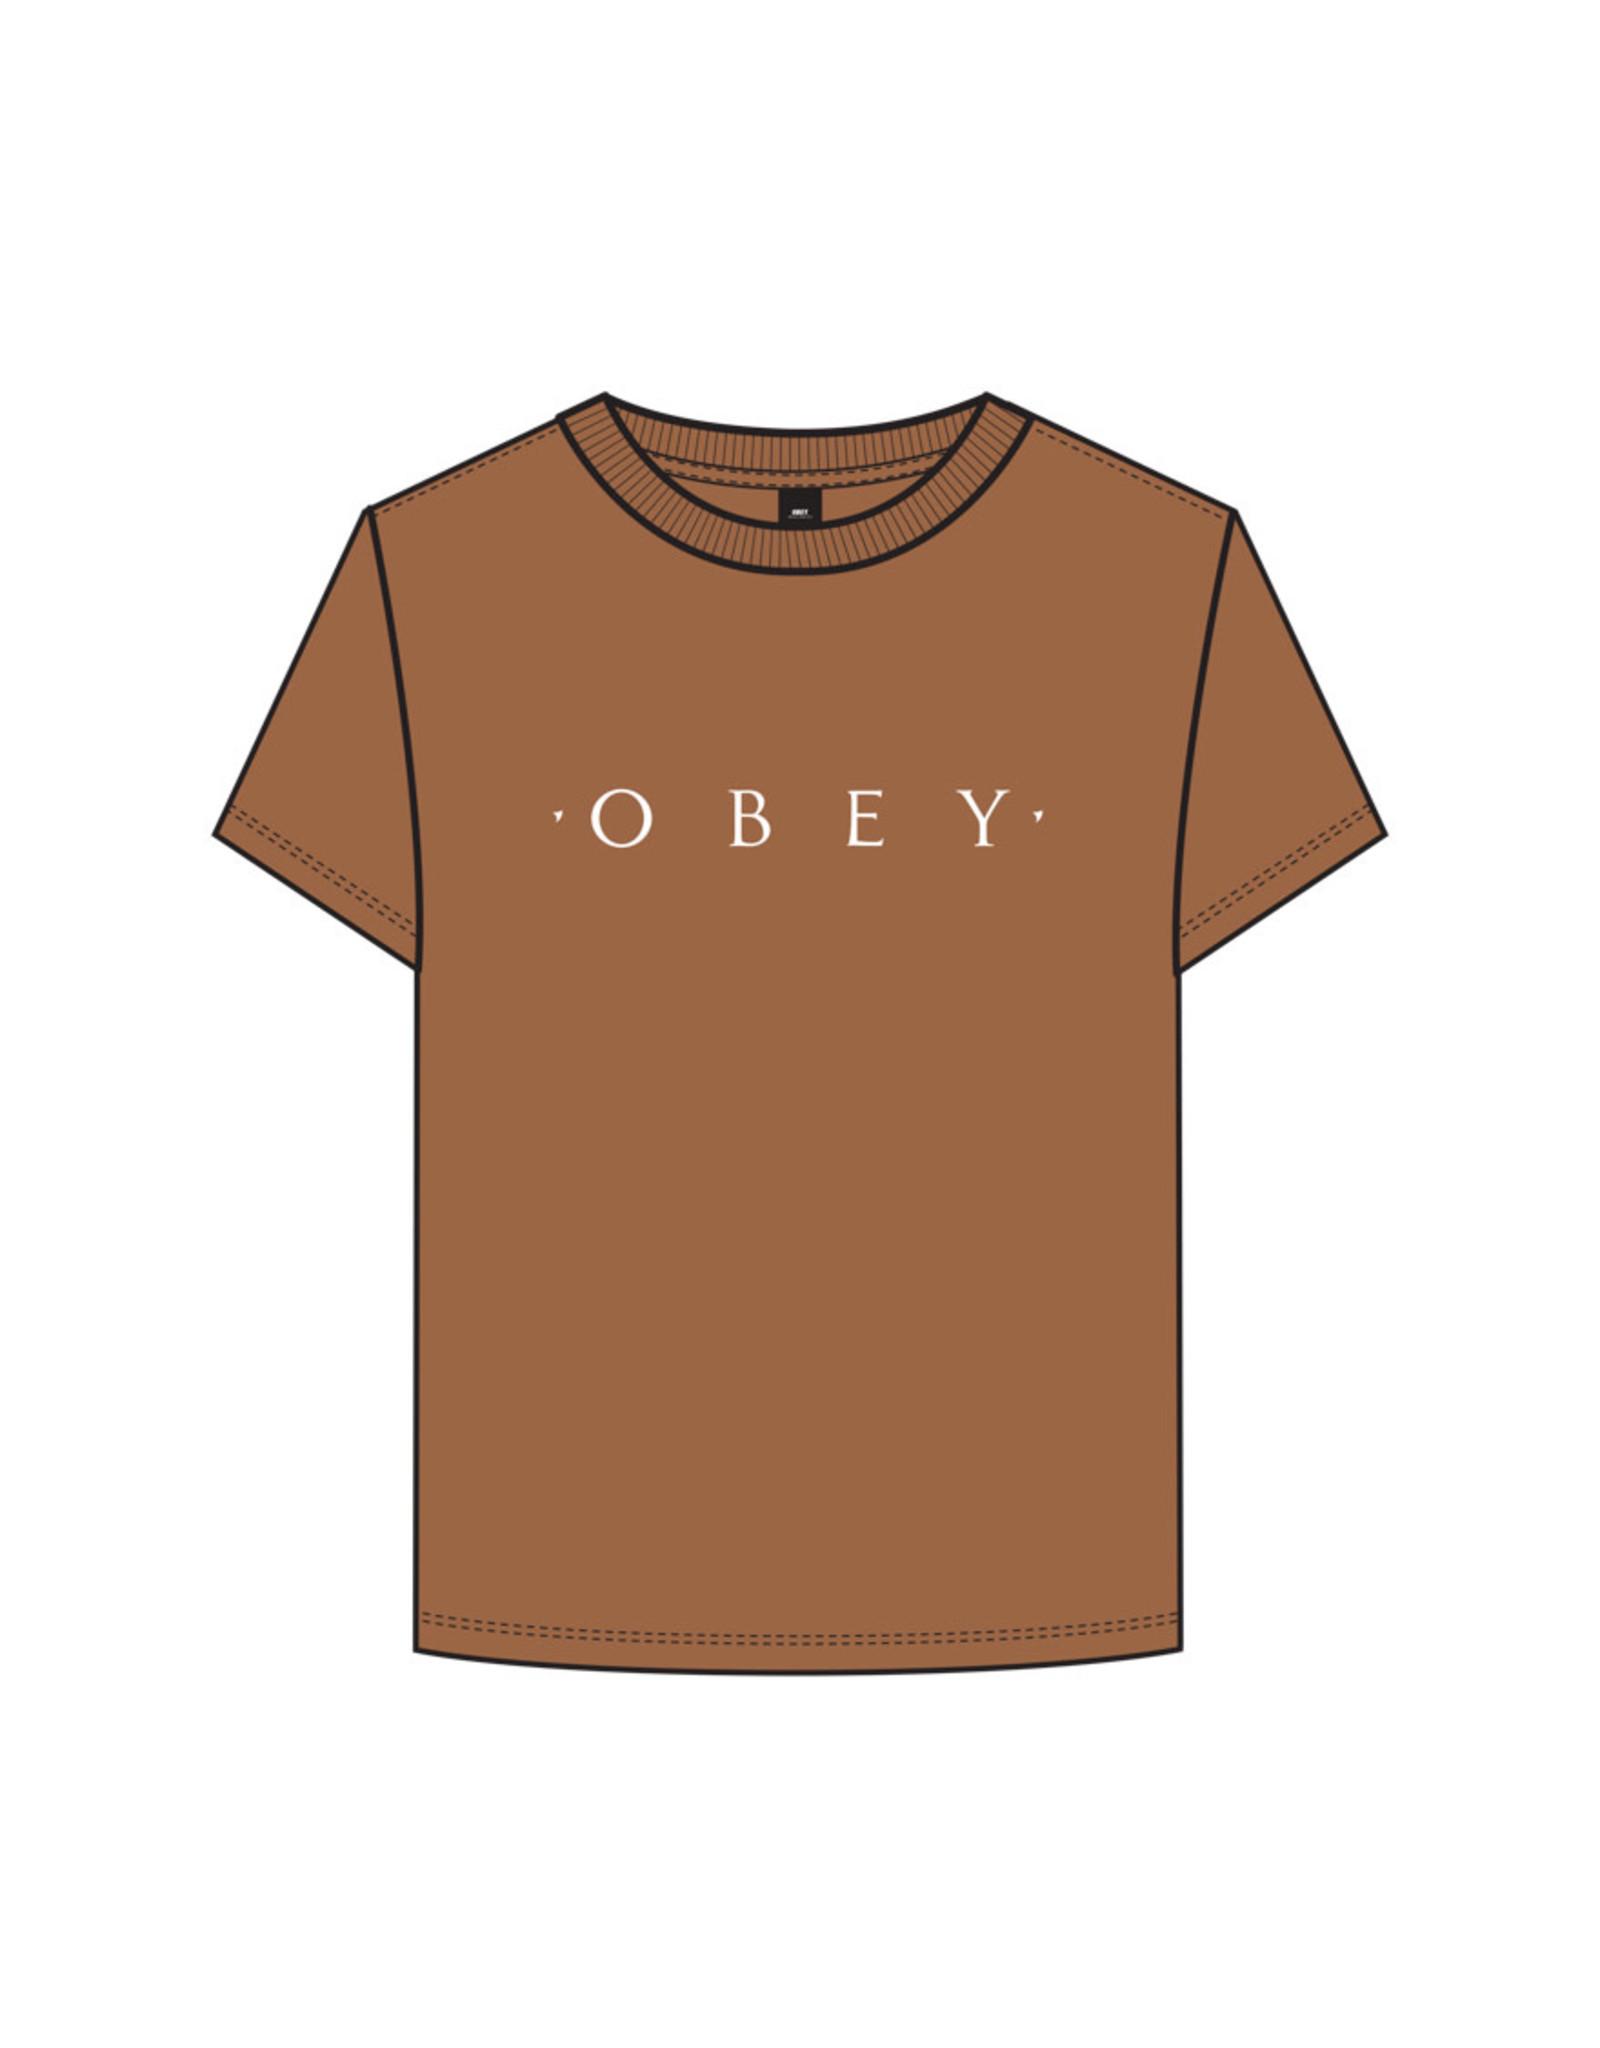 Obey Obey - T-shirt femme novel obey custom box adobe